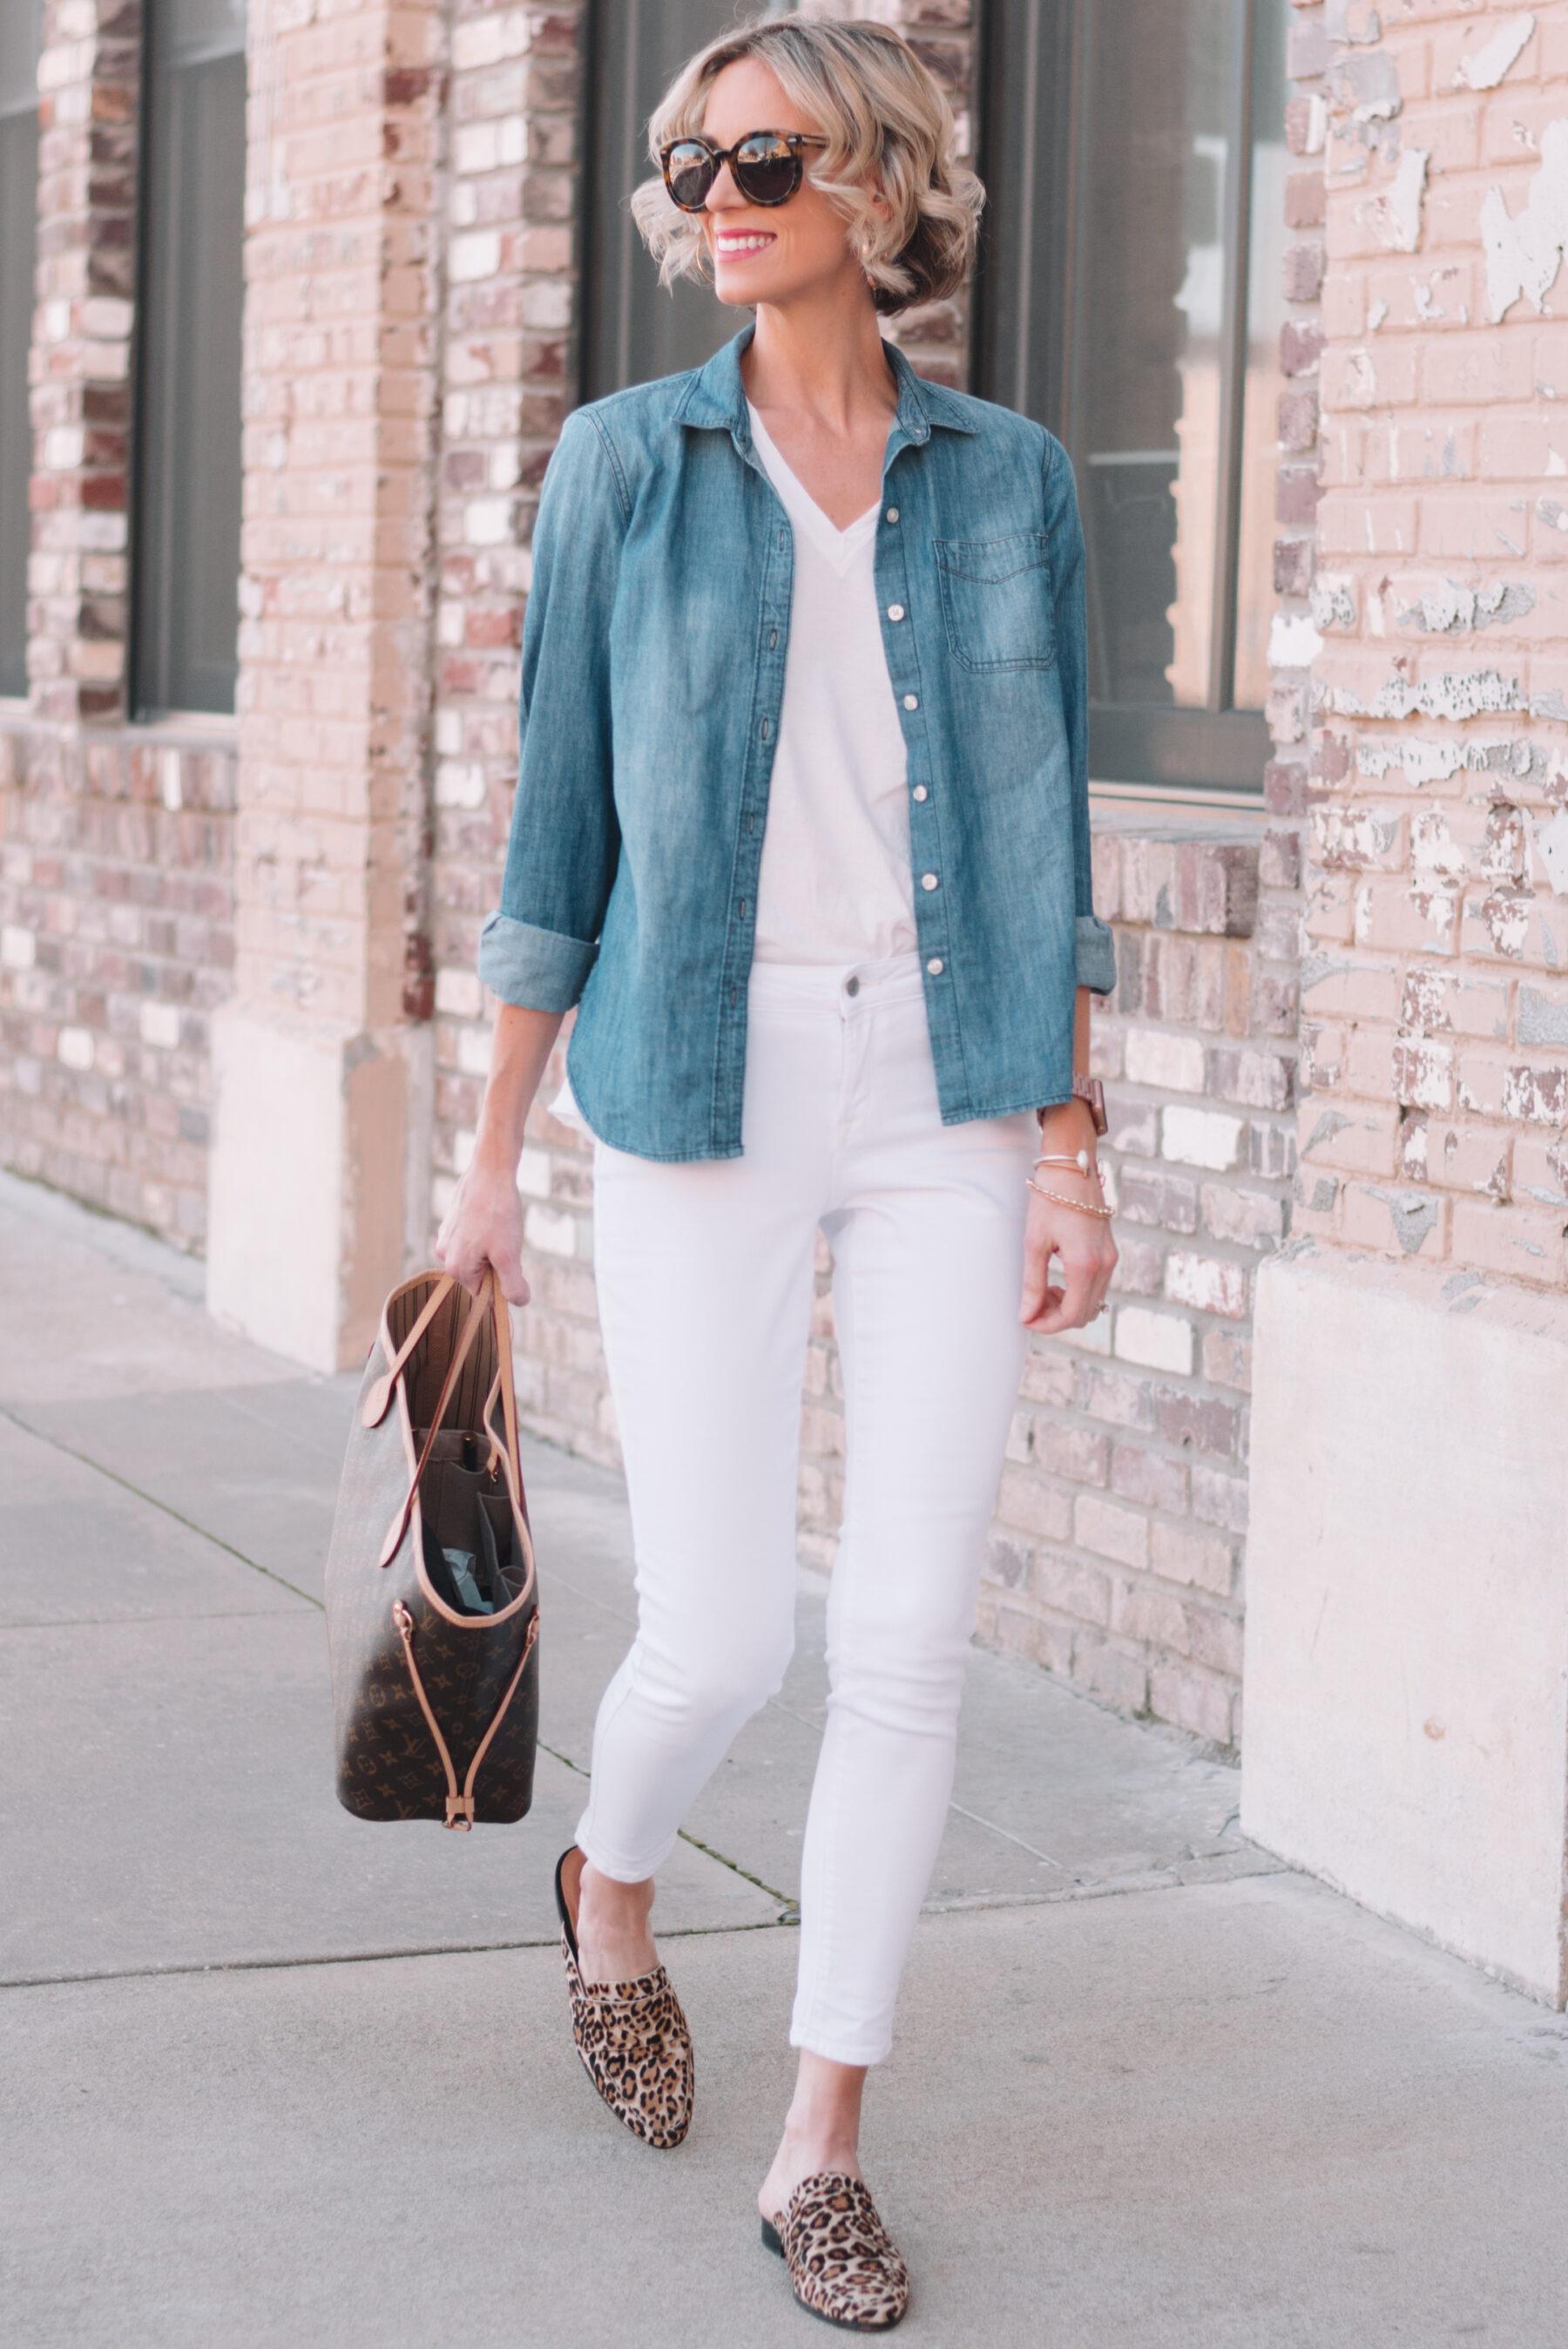 de4edc5c852 Mini Capsule Wardrobe - 4 Ways to Style a White T-Shirt - Straight A ...